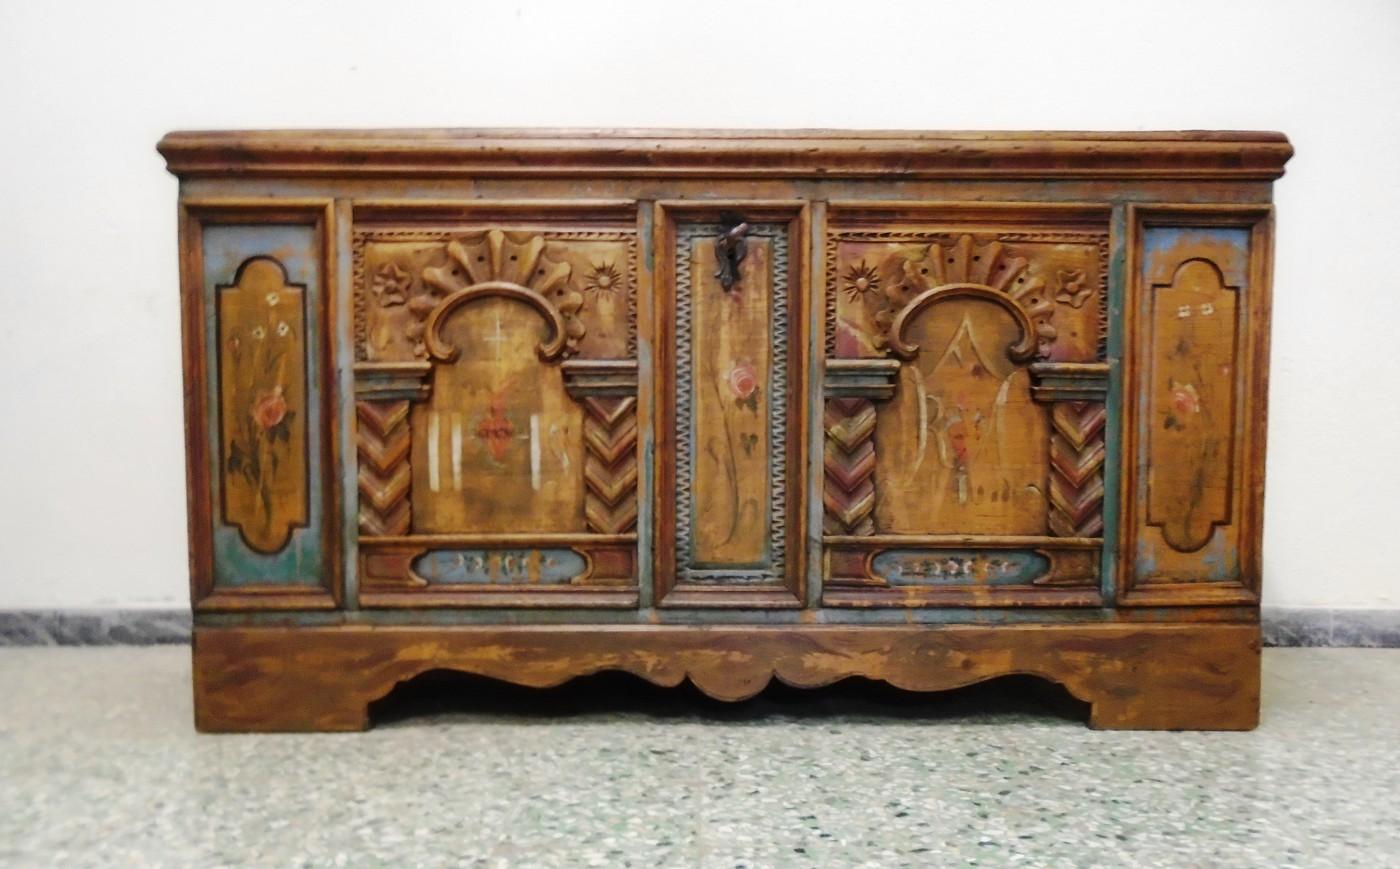 Cassapanca dipinta -prov. Austria  Antichità Evelina - Vendita mobili antichi tirolesi